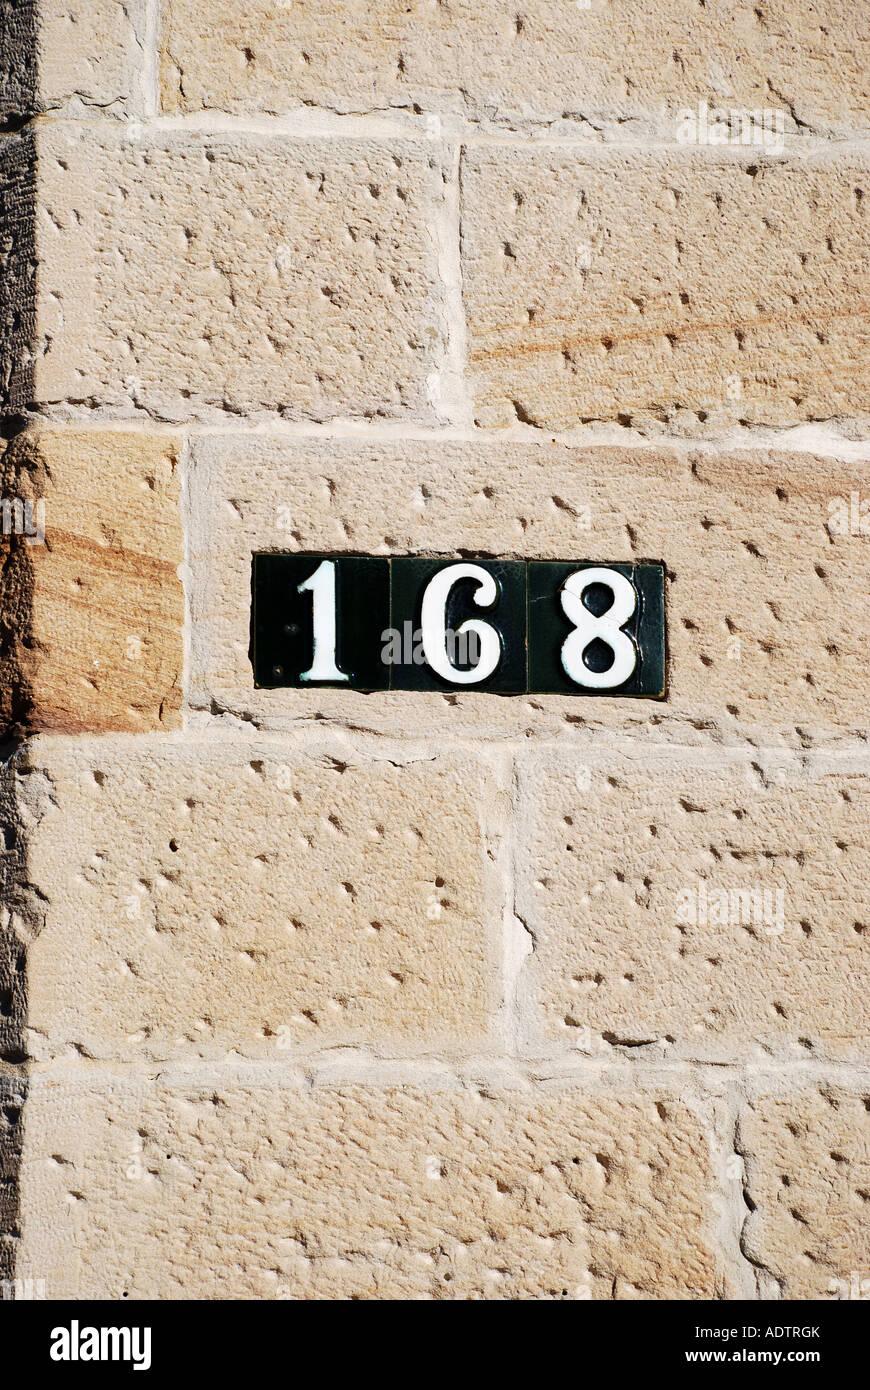 HOUSE NUMBERS ON STONE WALL BALMAIN SYDNEY AUSTRALIA Stock Photo